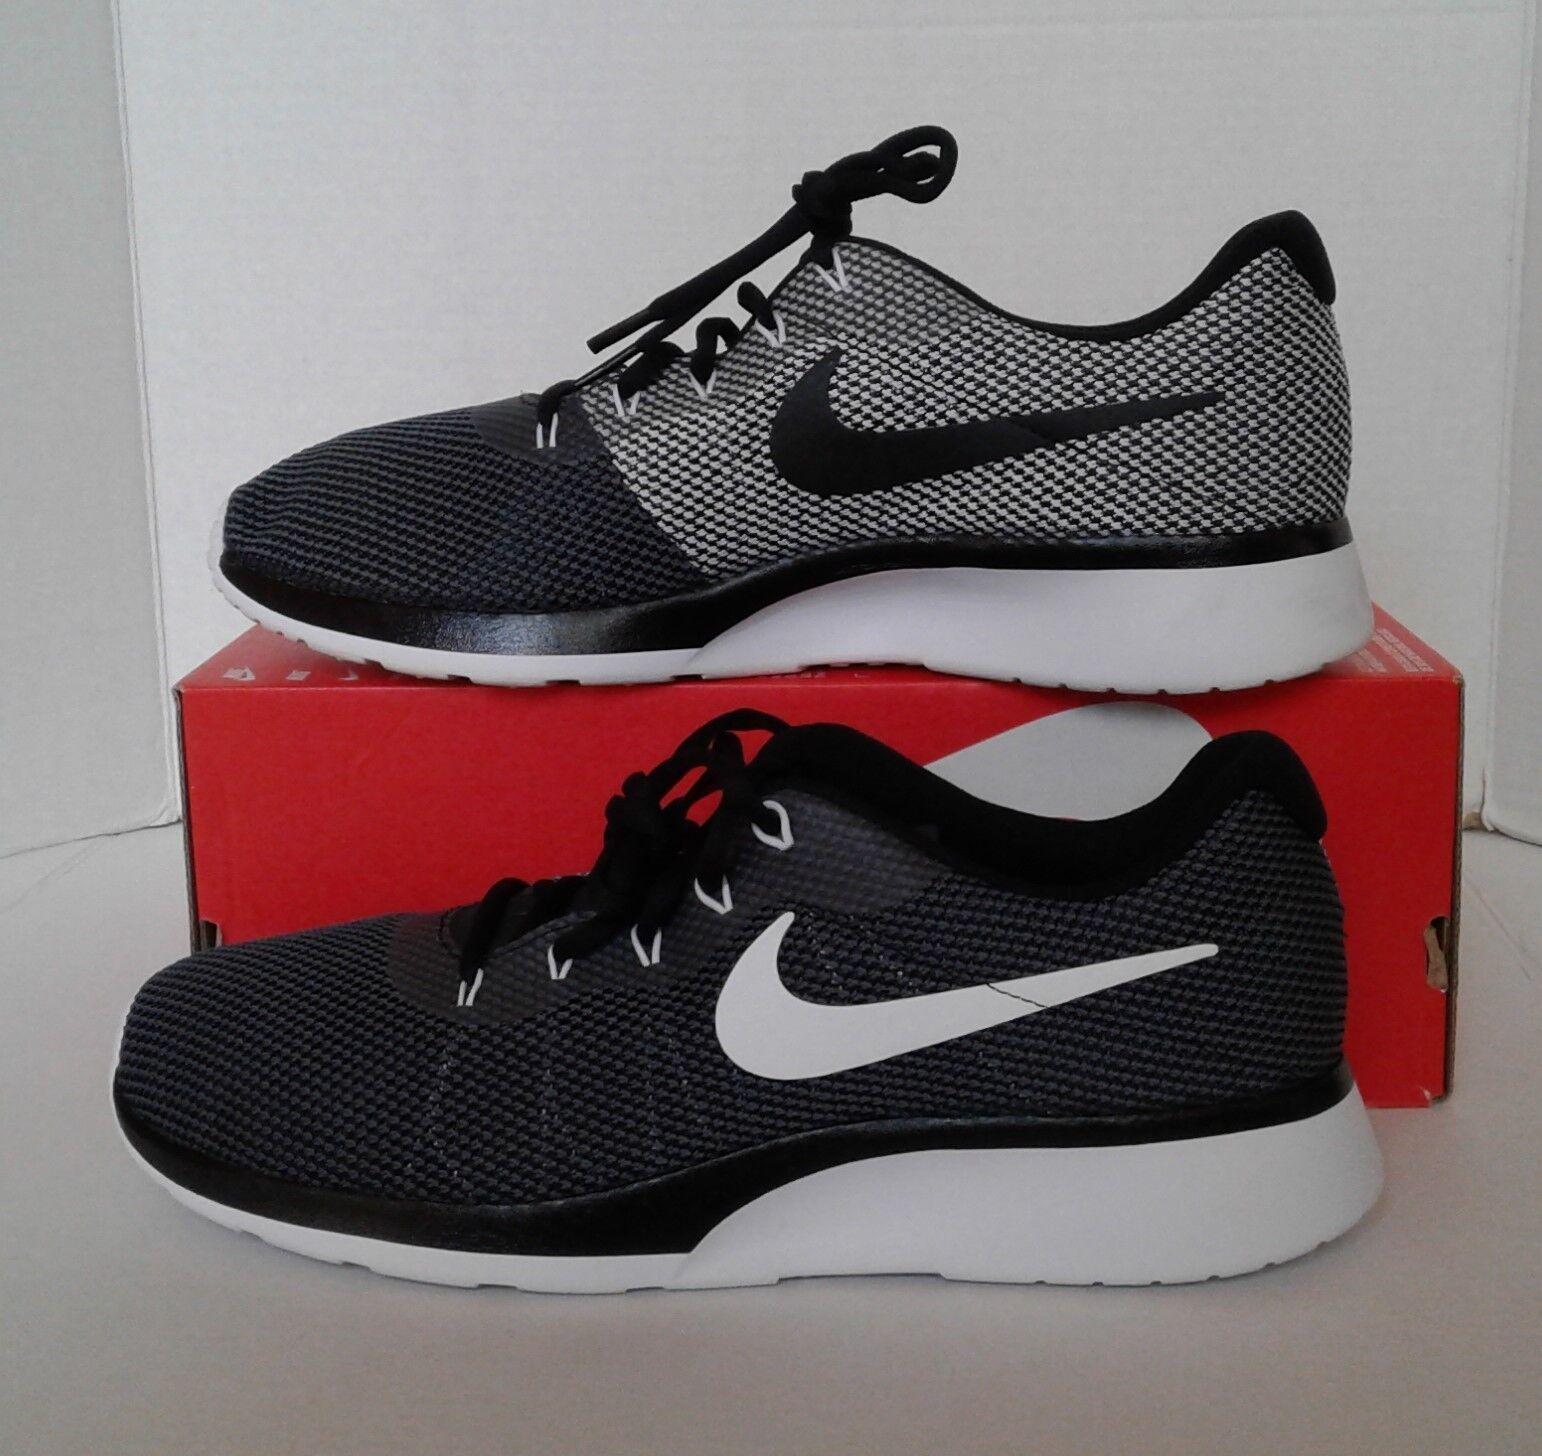 Nuove Nike Uomini È Tanjun Grigio Scuro / Nero / Bianco Tanjun È Racer Scarpa Sz 9.5,10,11 921669 002 5fca56